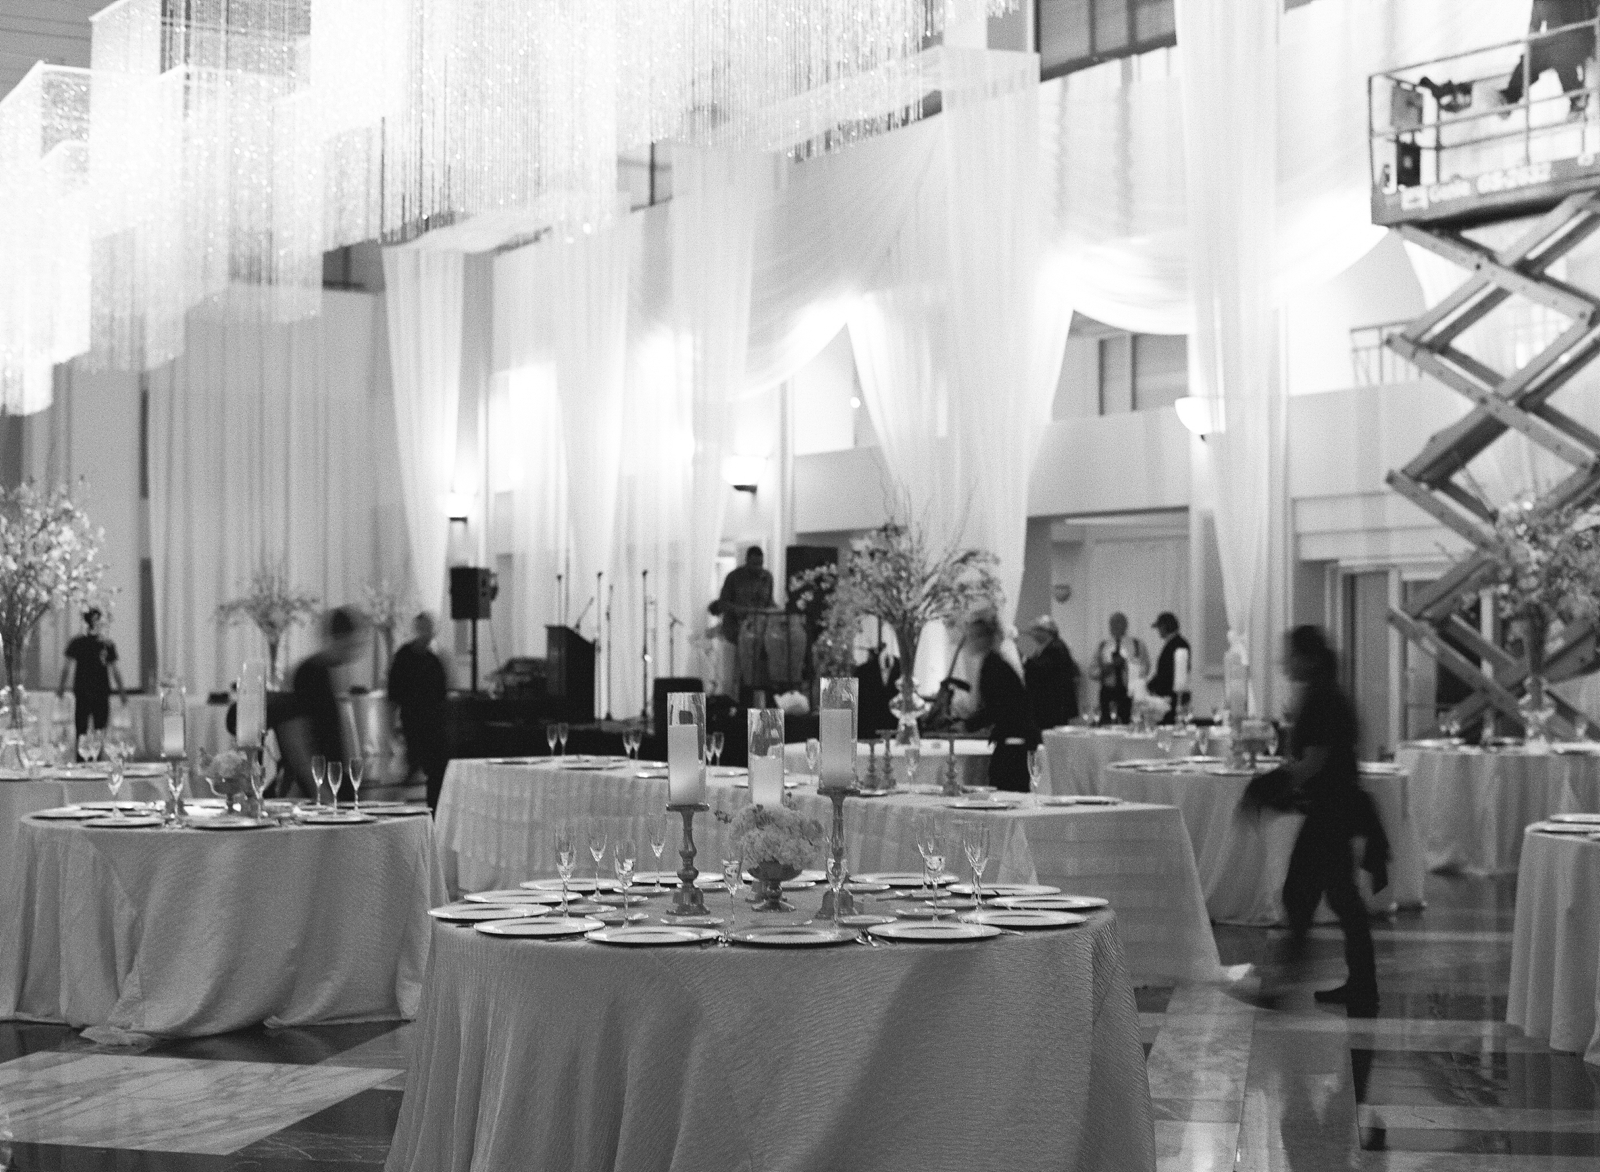 atrium at curtis center wedding photographer philadelphia wedding photographer shannon griffin_0011.jpg